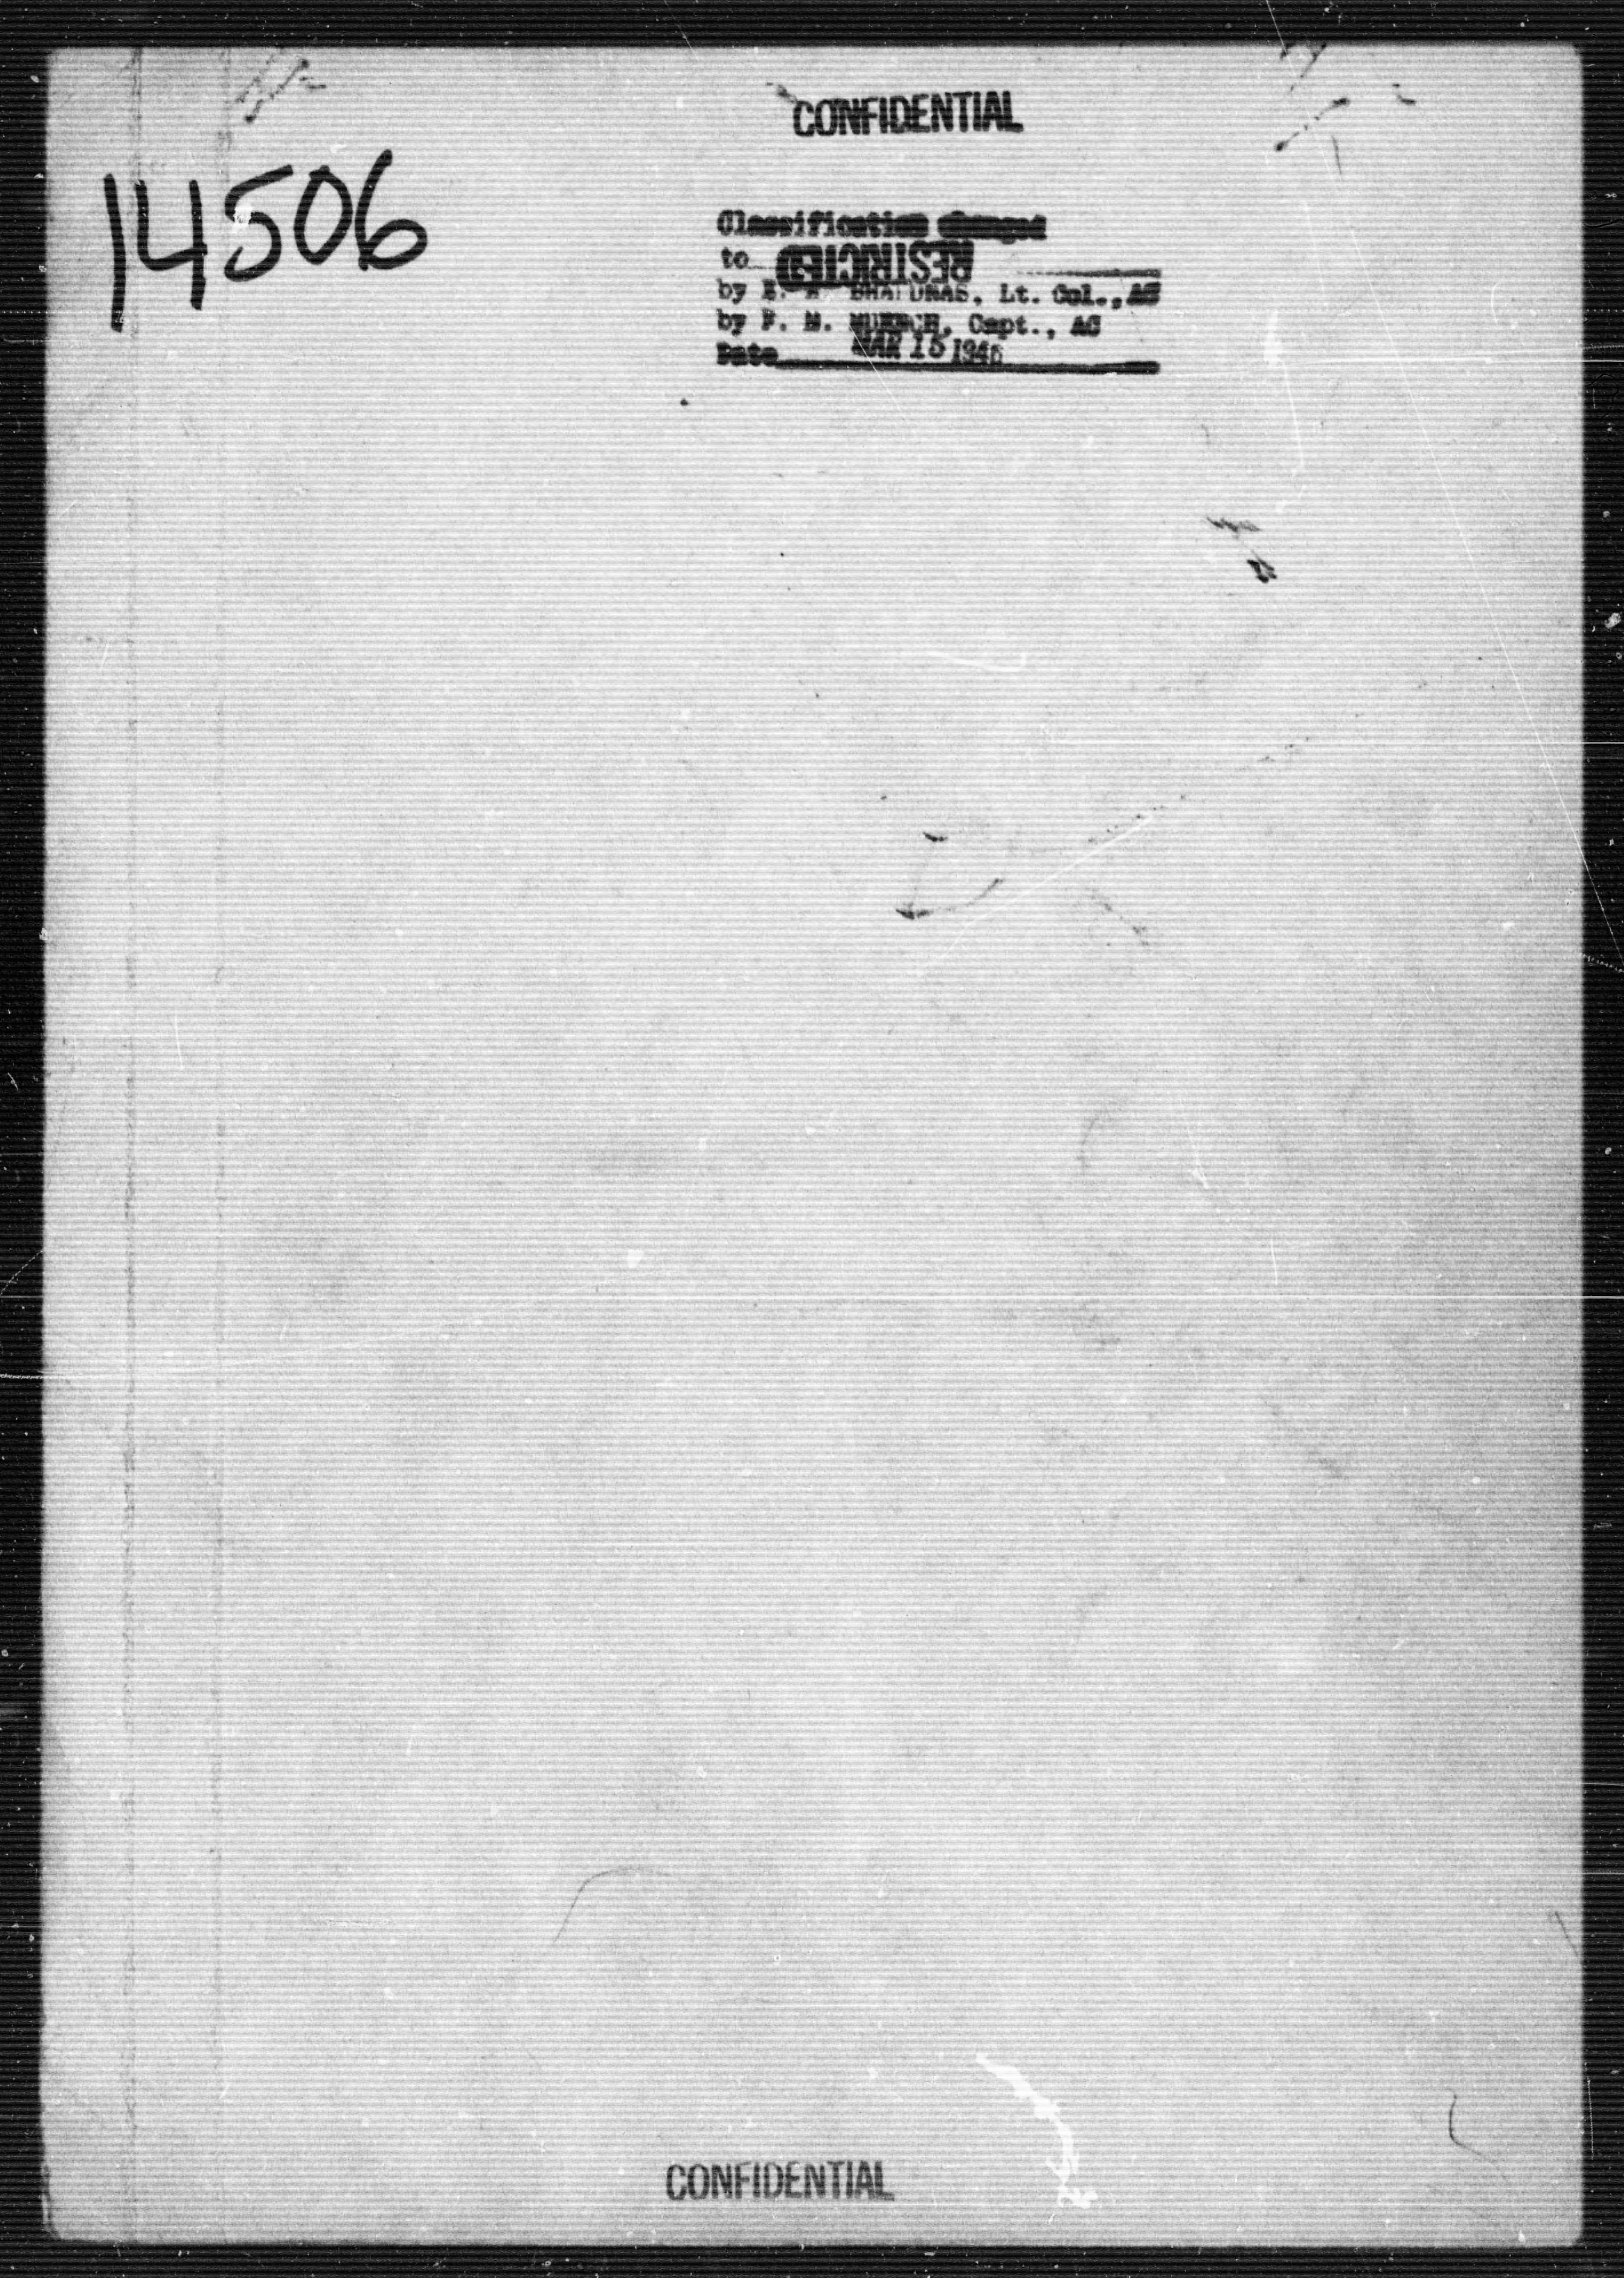 Missing Air Crew Report number 14506